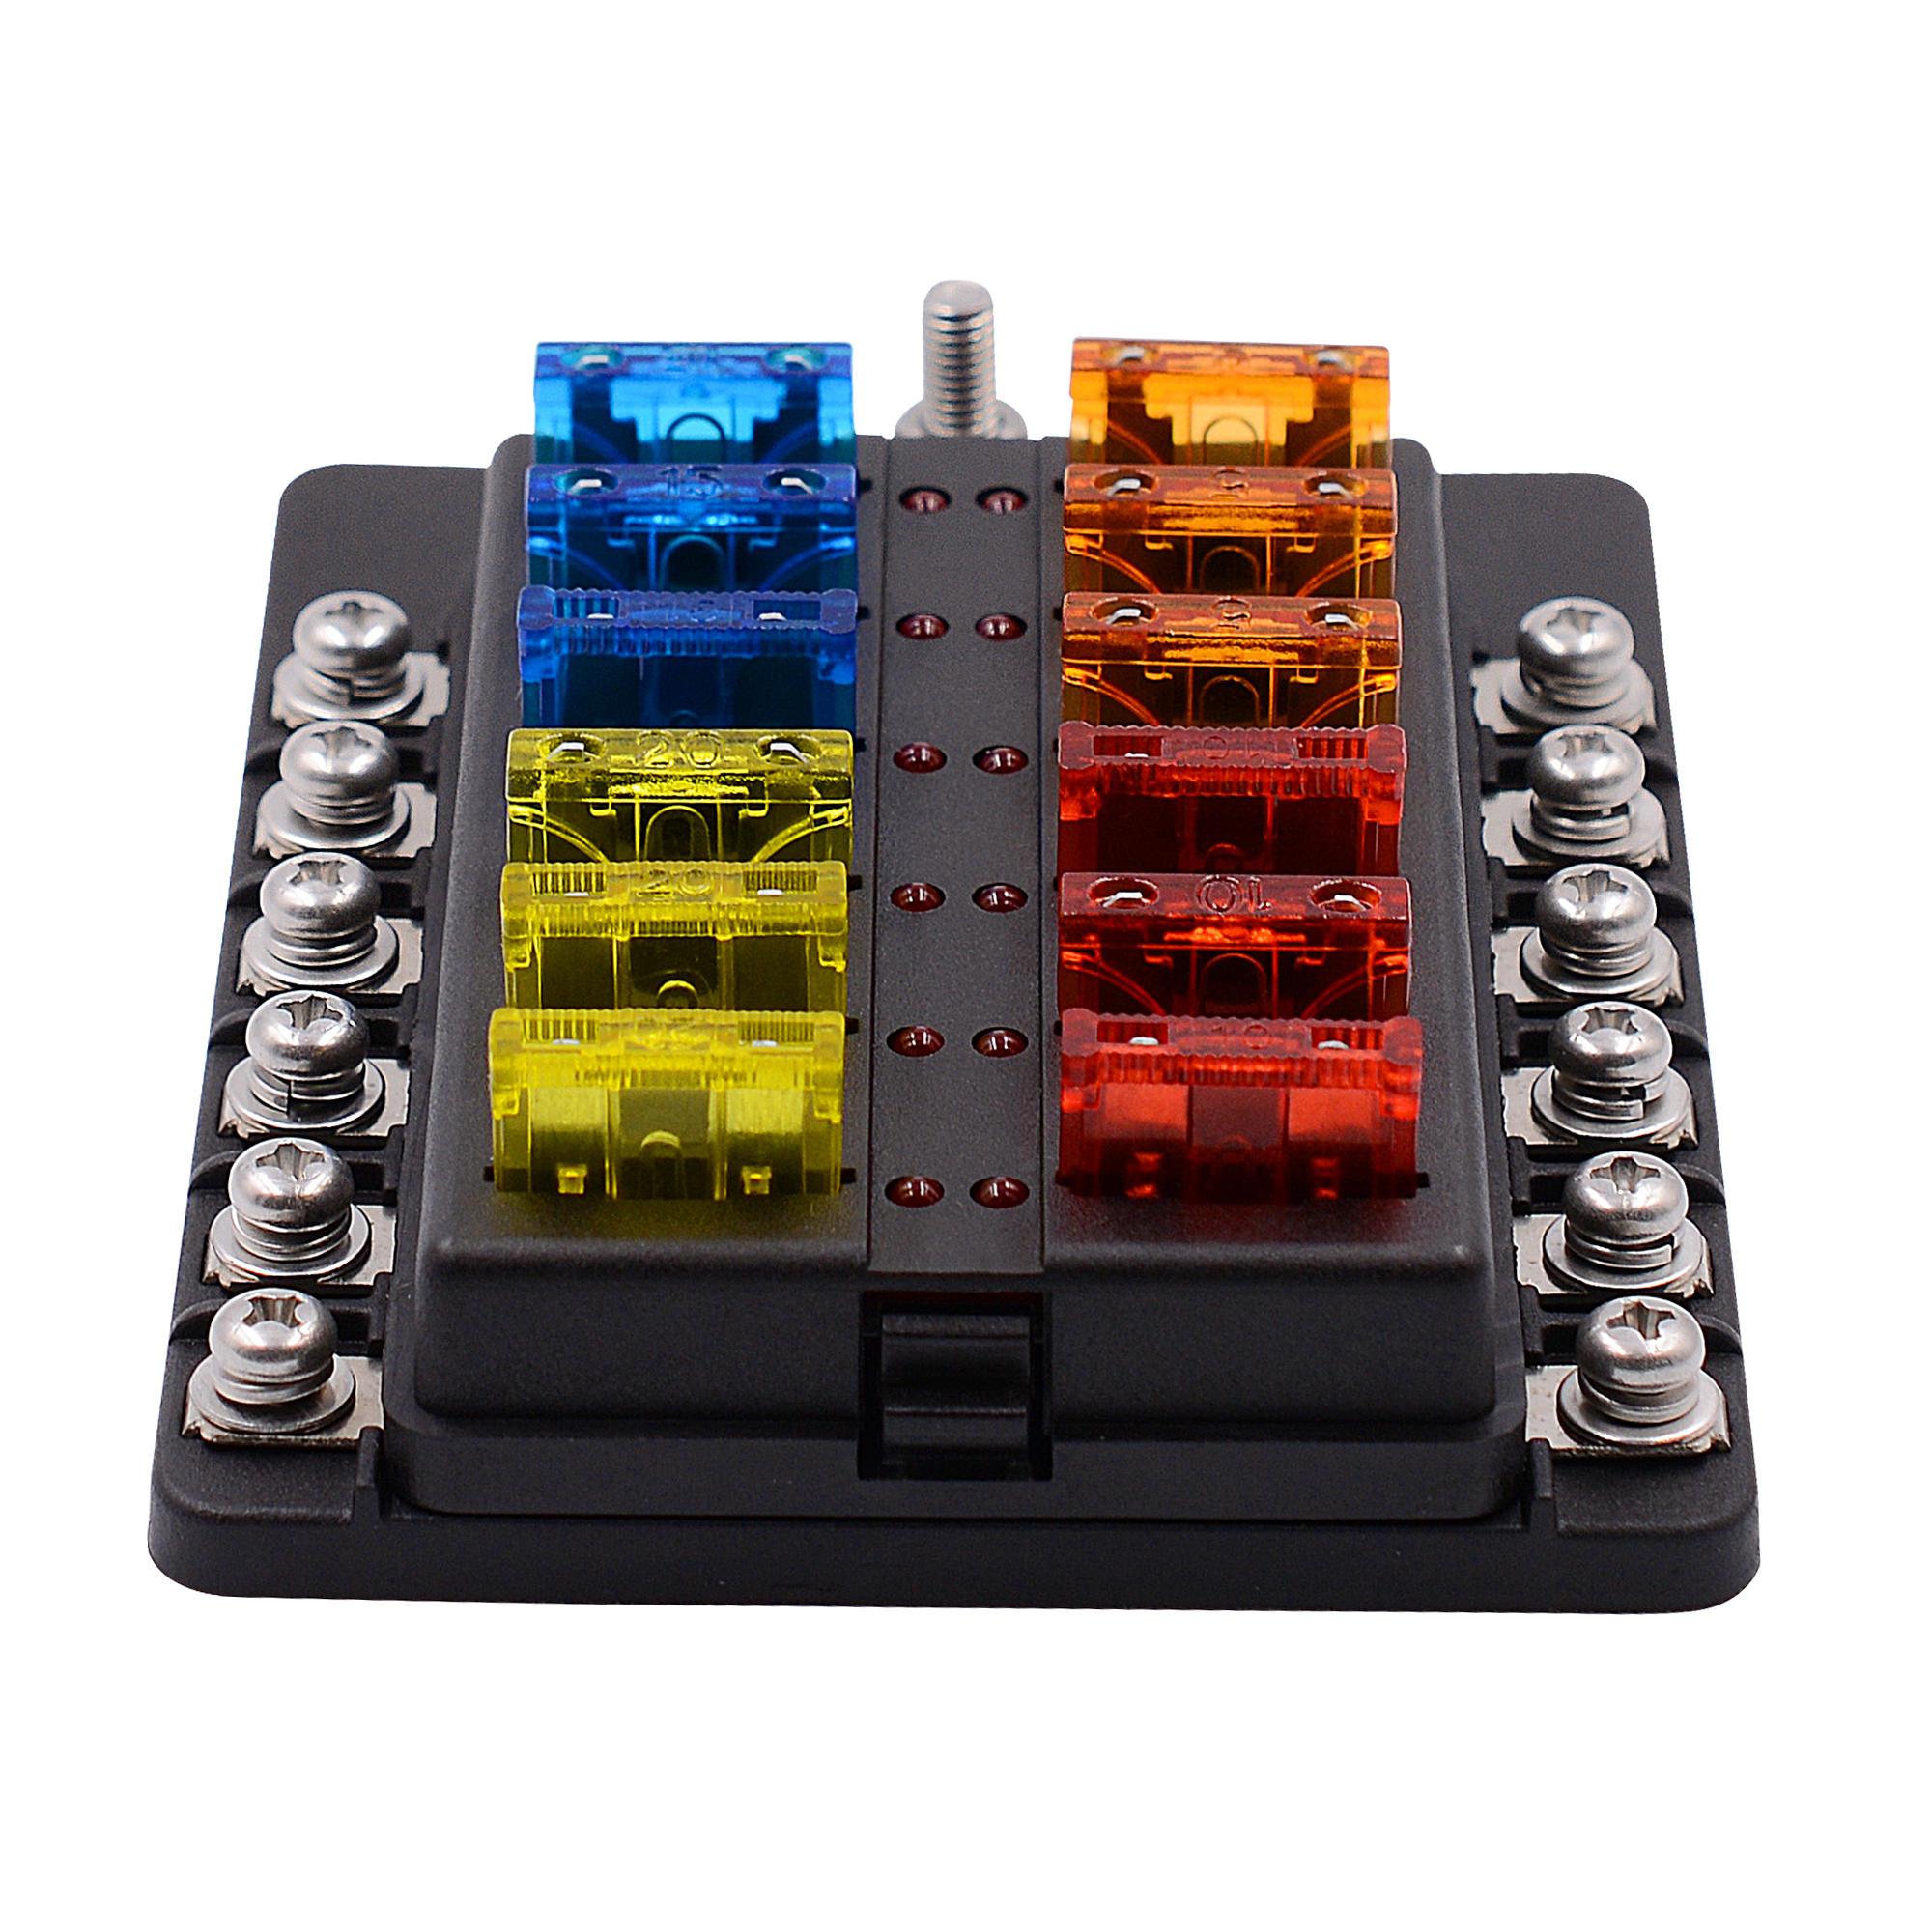 fuse box labels kit imars    12 way    fuse       box    12v 32v circuit standard blade  imars    12 way    fuse       box    12v 32v circuit standard blade